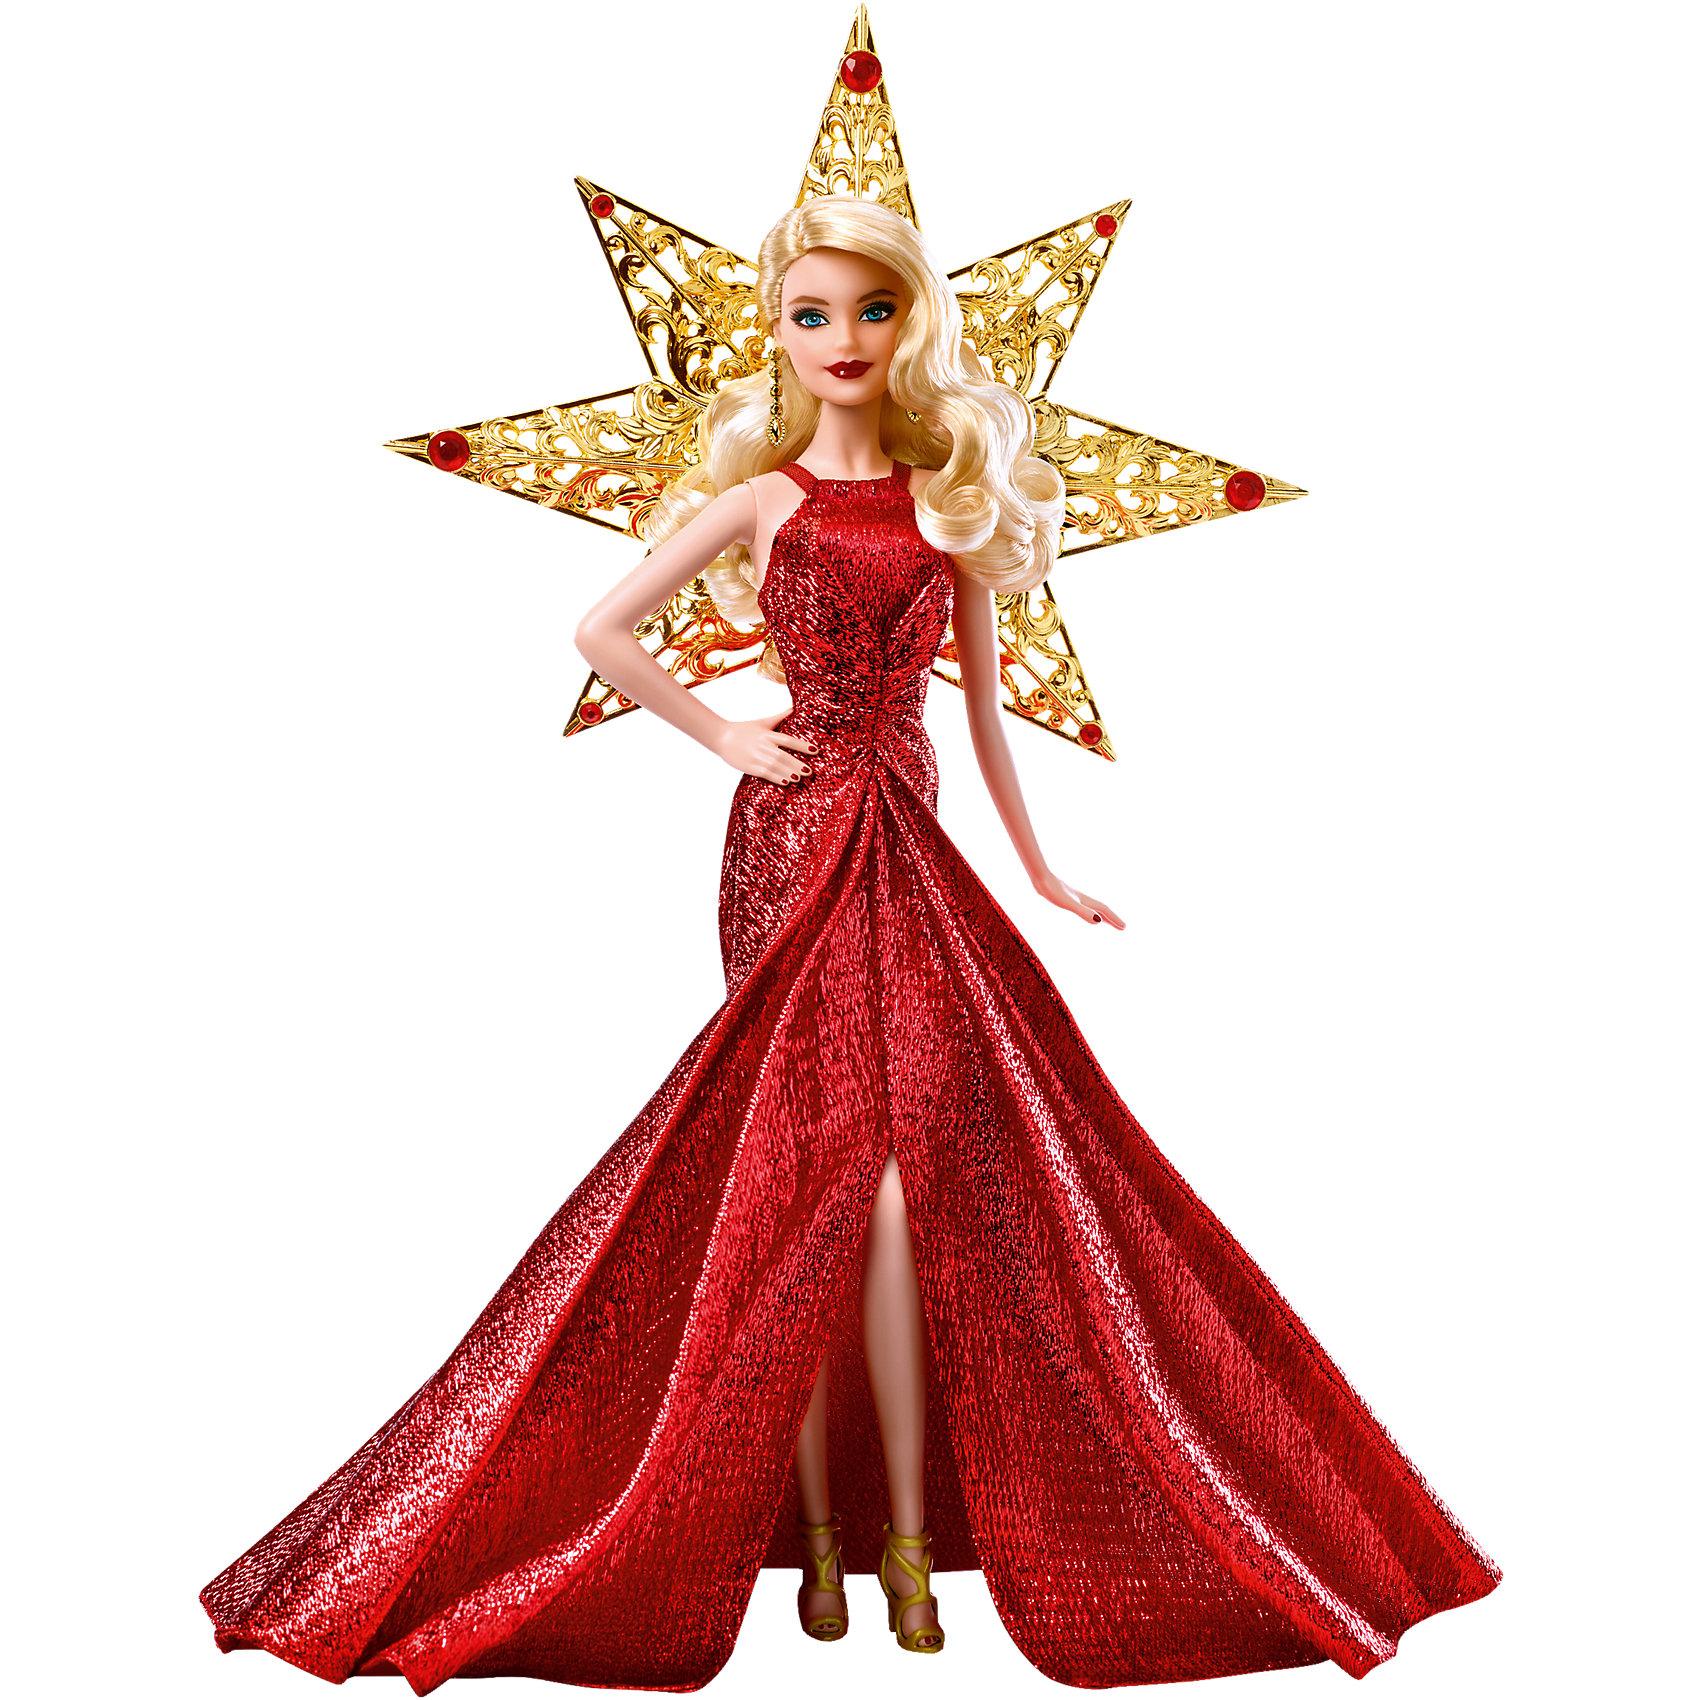 Кукла Barbie Праздничная в золотом платьеBarbie<br><br><br>Ширина мм: 339<br>Глубина мм: 271<br>Высота мм: 83<br>Вес г: 447<br>Возраст от месяцев: 72<br>Возраст до месяцев: 144<br>Пол: Женский<br>Возраст: Детский<br>SKU: 6771454